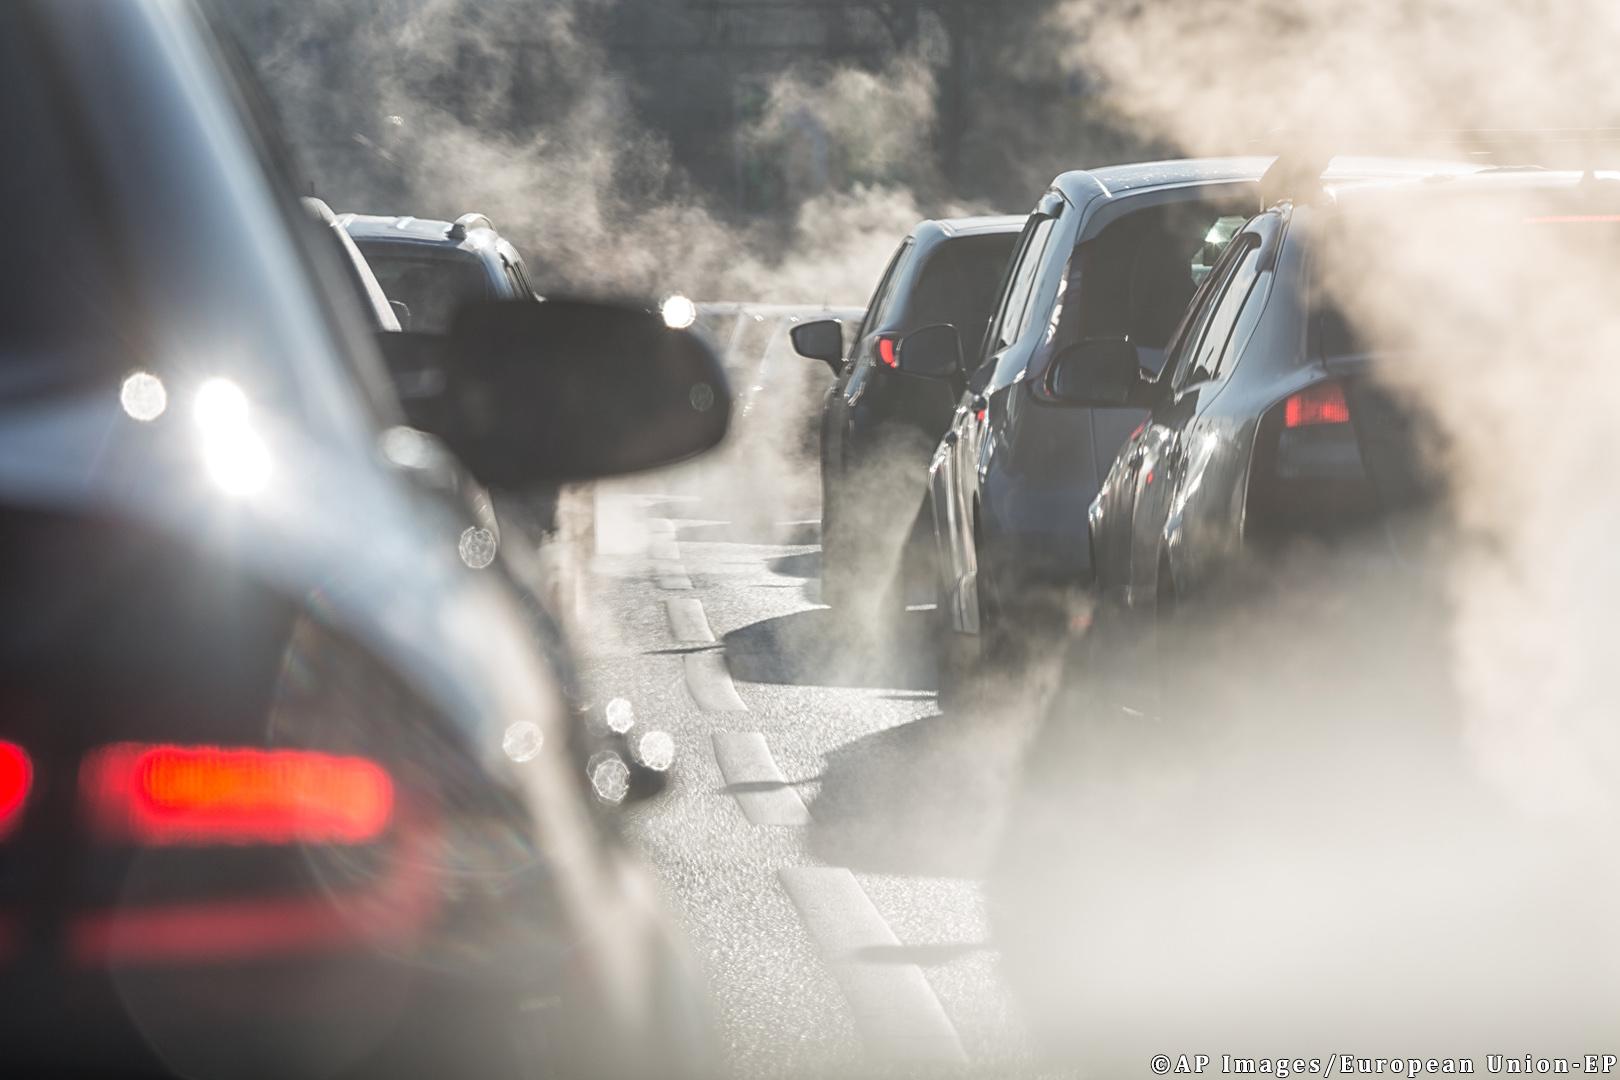 EU: Less CO2 Emissions by 2030